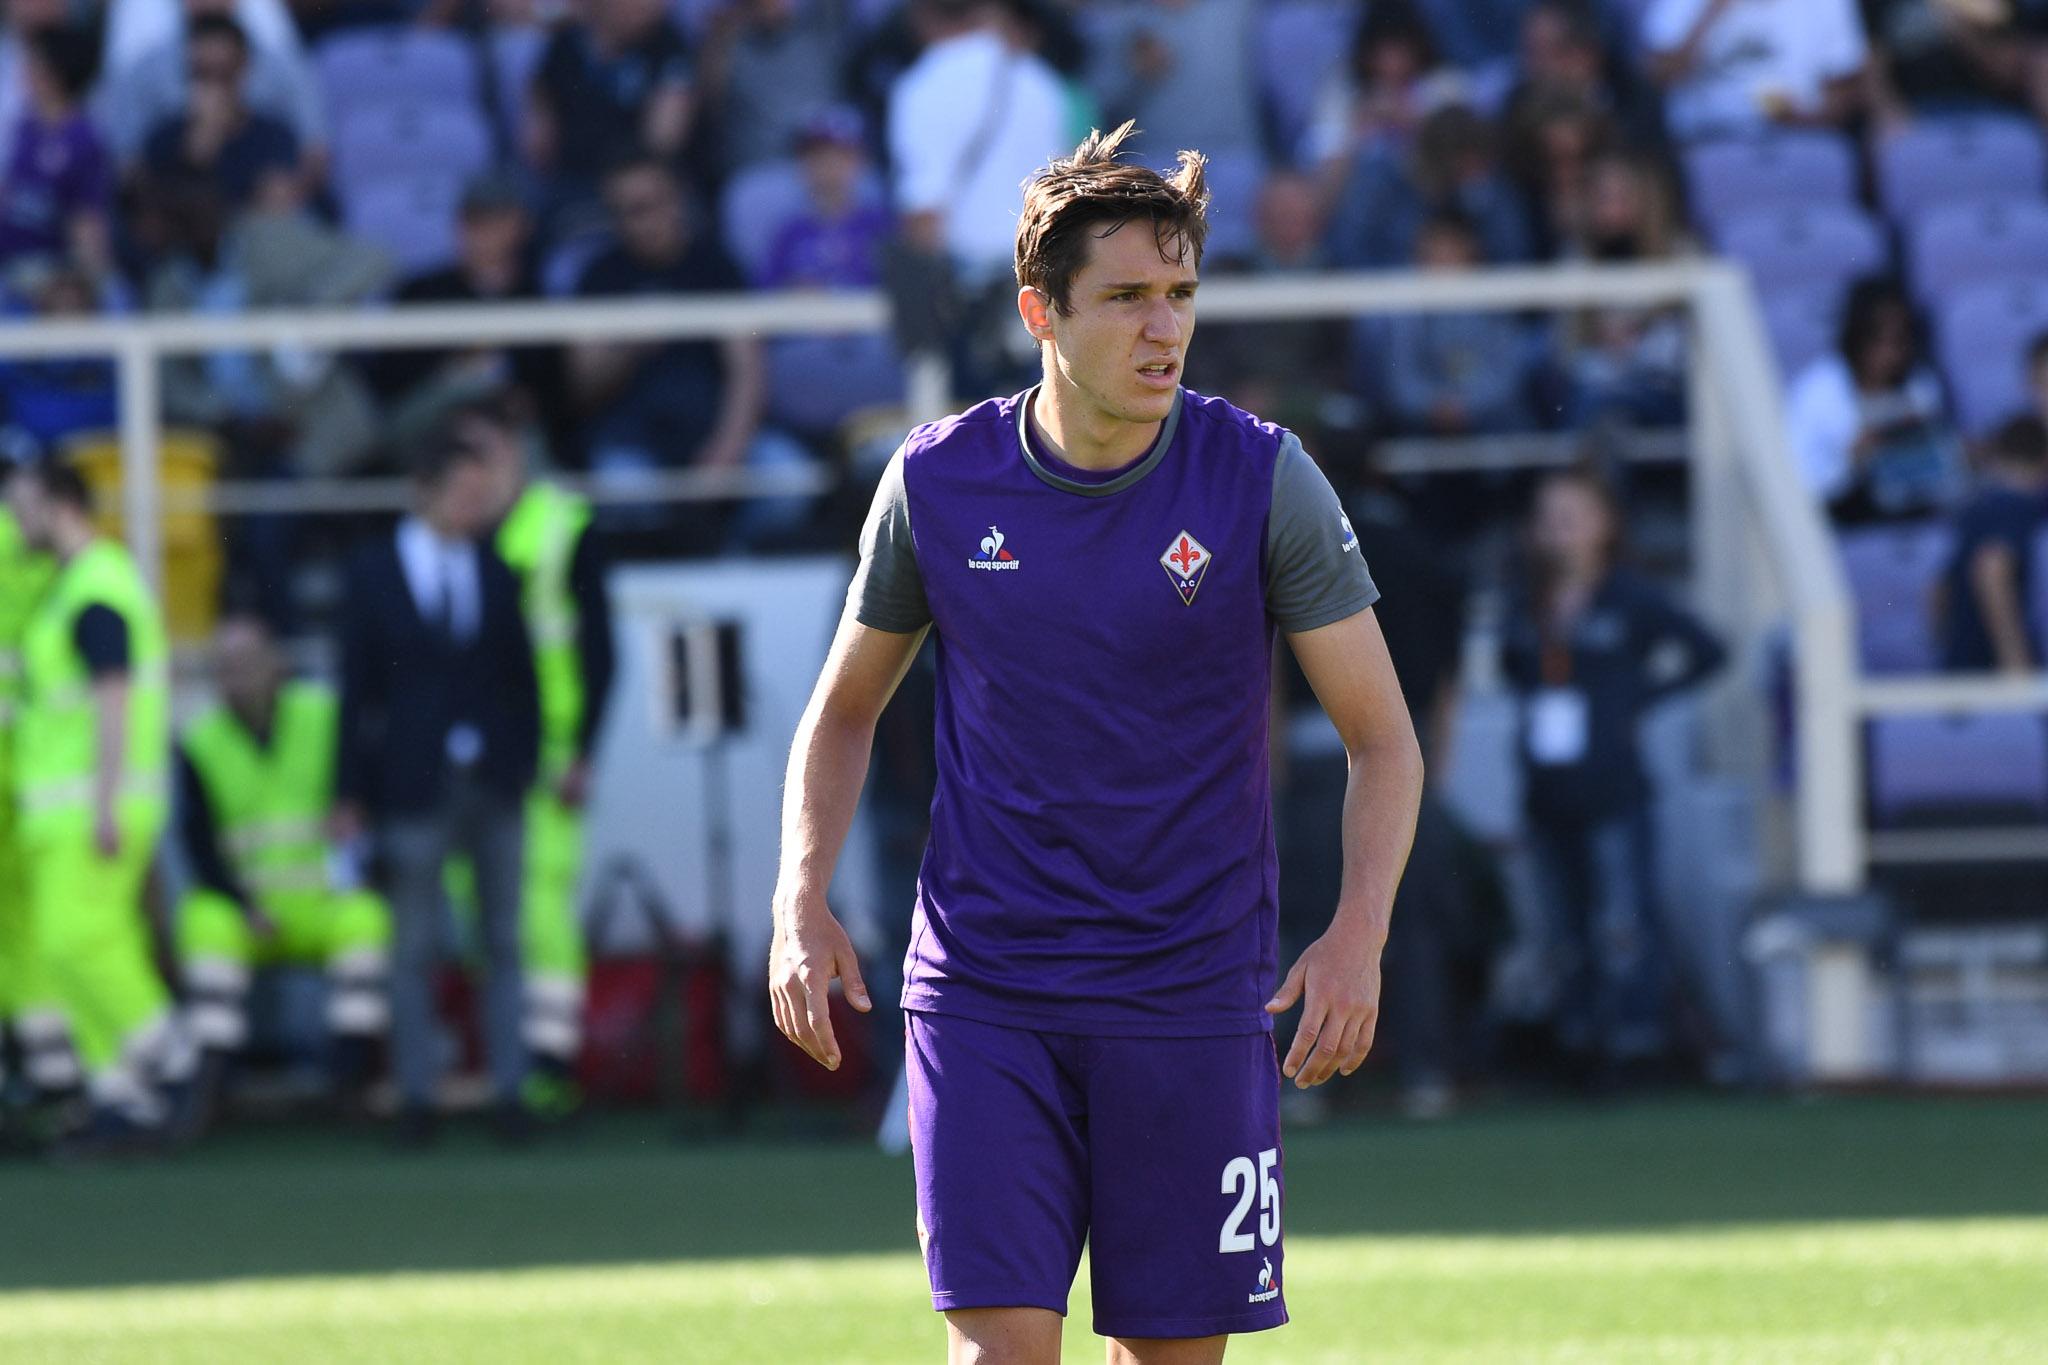 LIVE Braunschweig-Fiorentina: subito doppietta Chiesa, Rebic assistman…